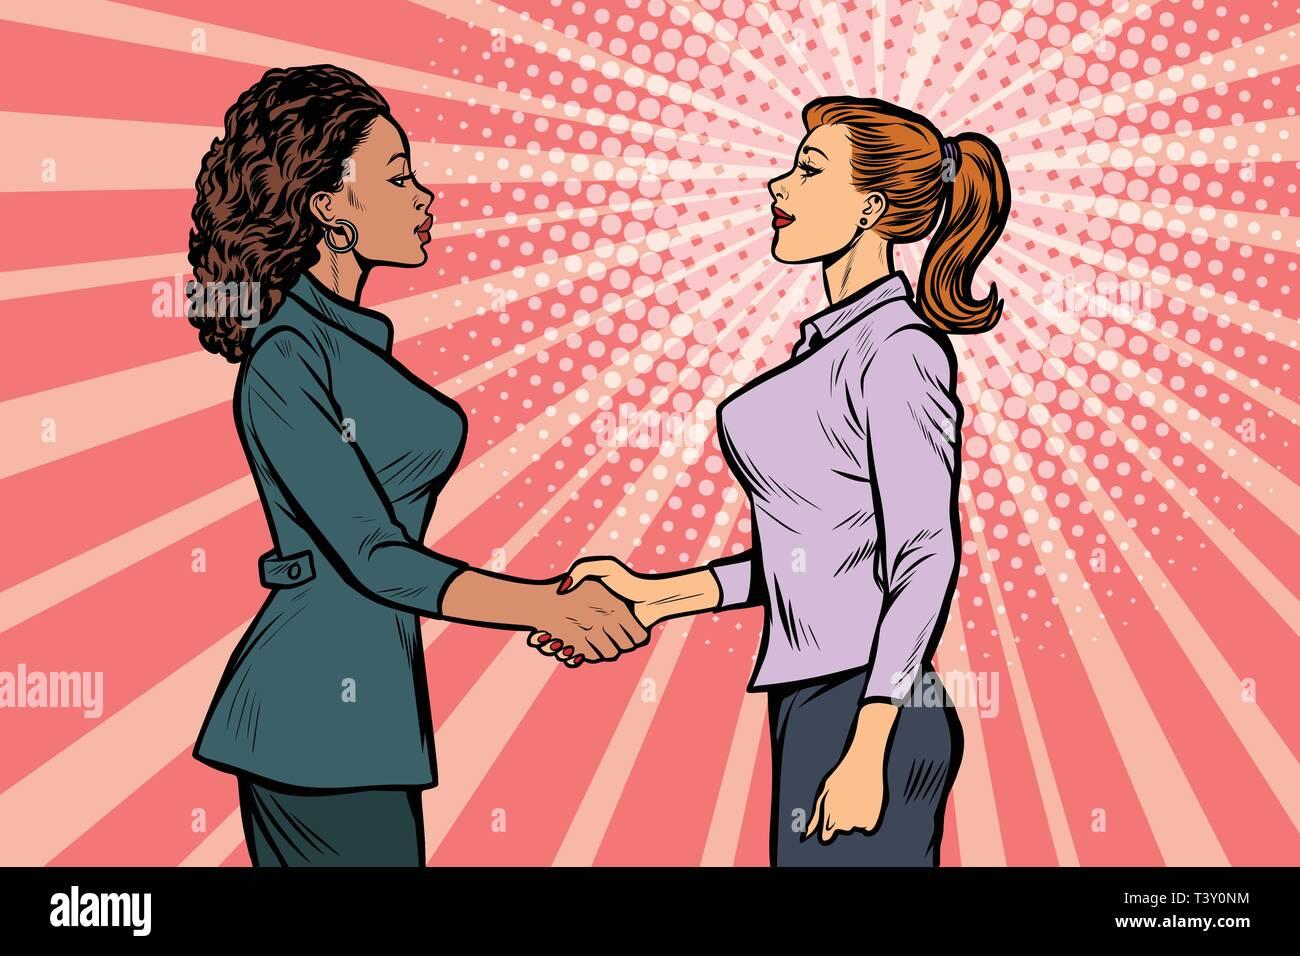 two businesswomen shaking hands. Pop art retro vector illustration vintage kitsch 50s 60s - Stock Vector